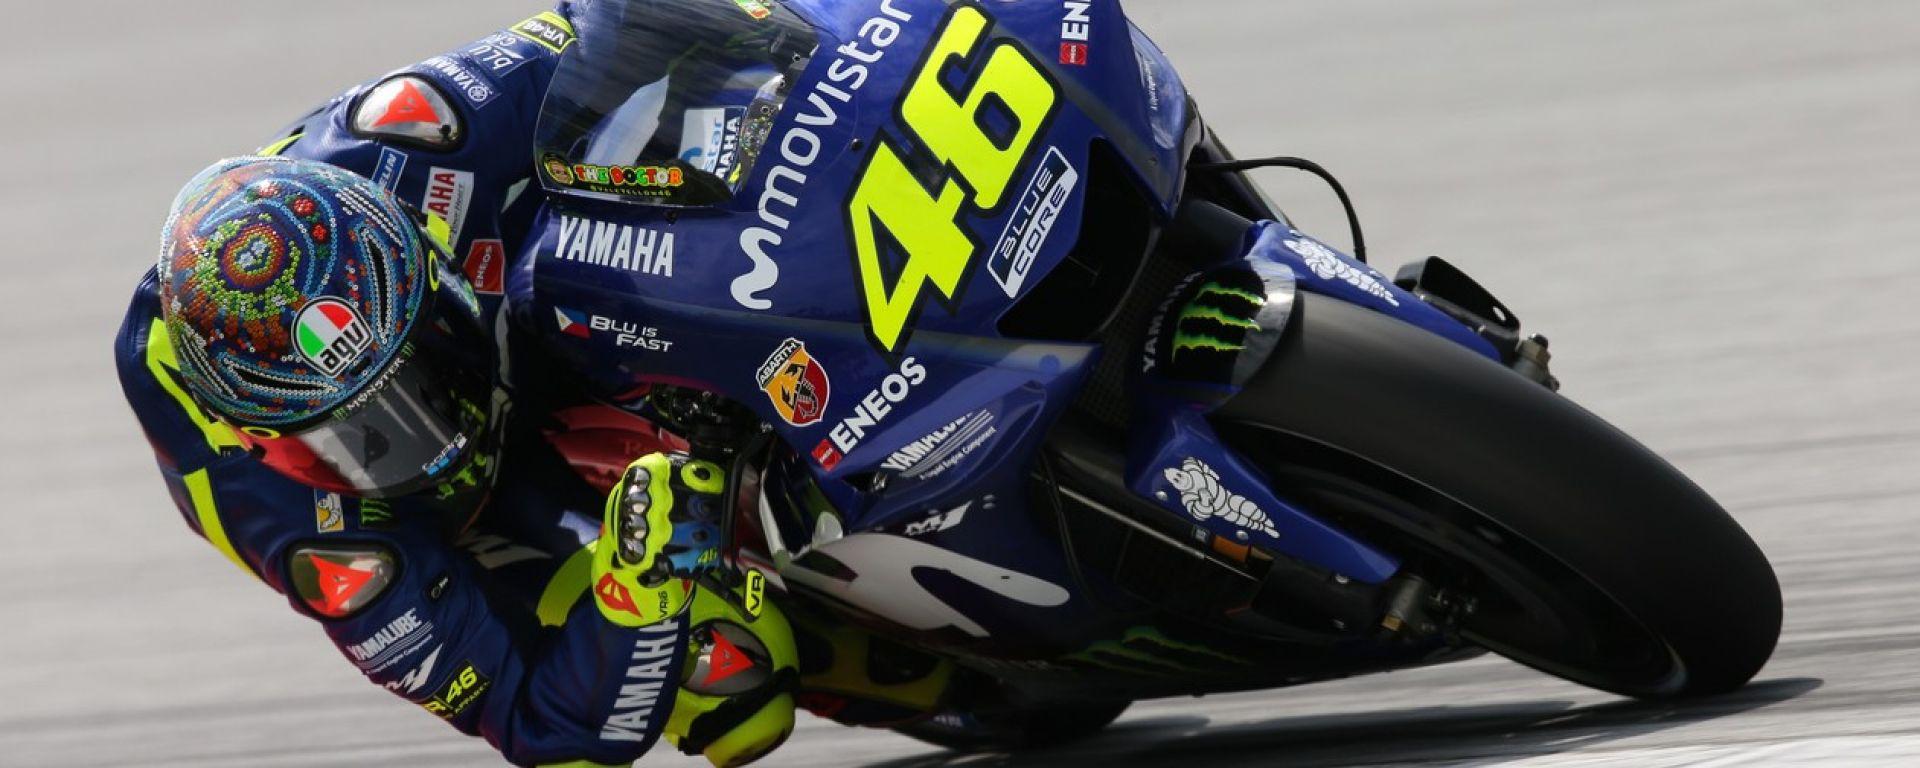 MotoGP: Yamaha dà più peso a Rossi che a Vinales per la M1 - MotorBox